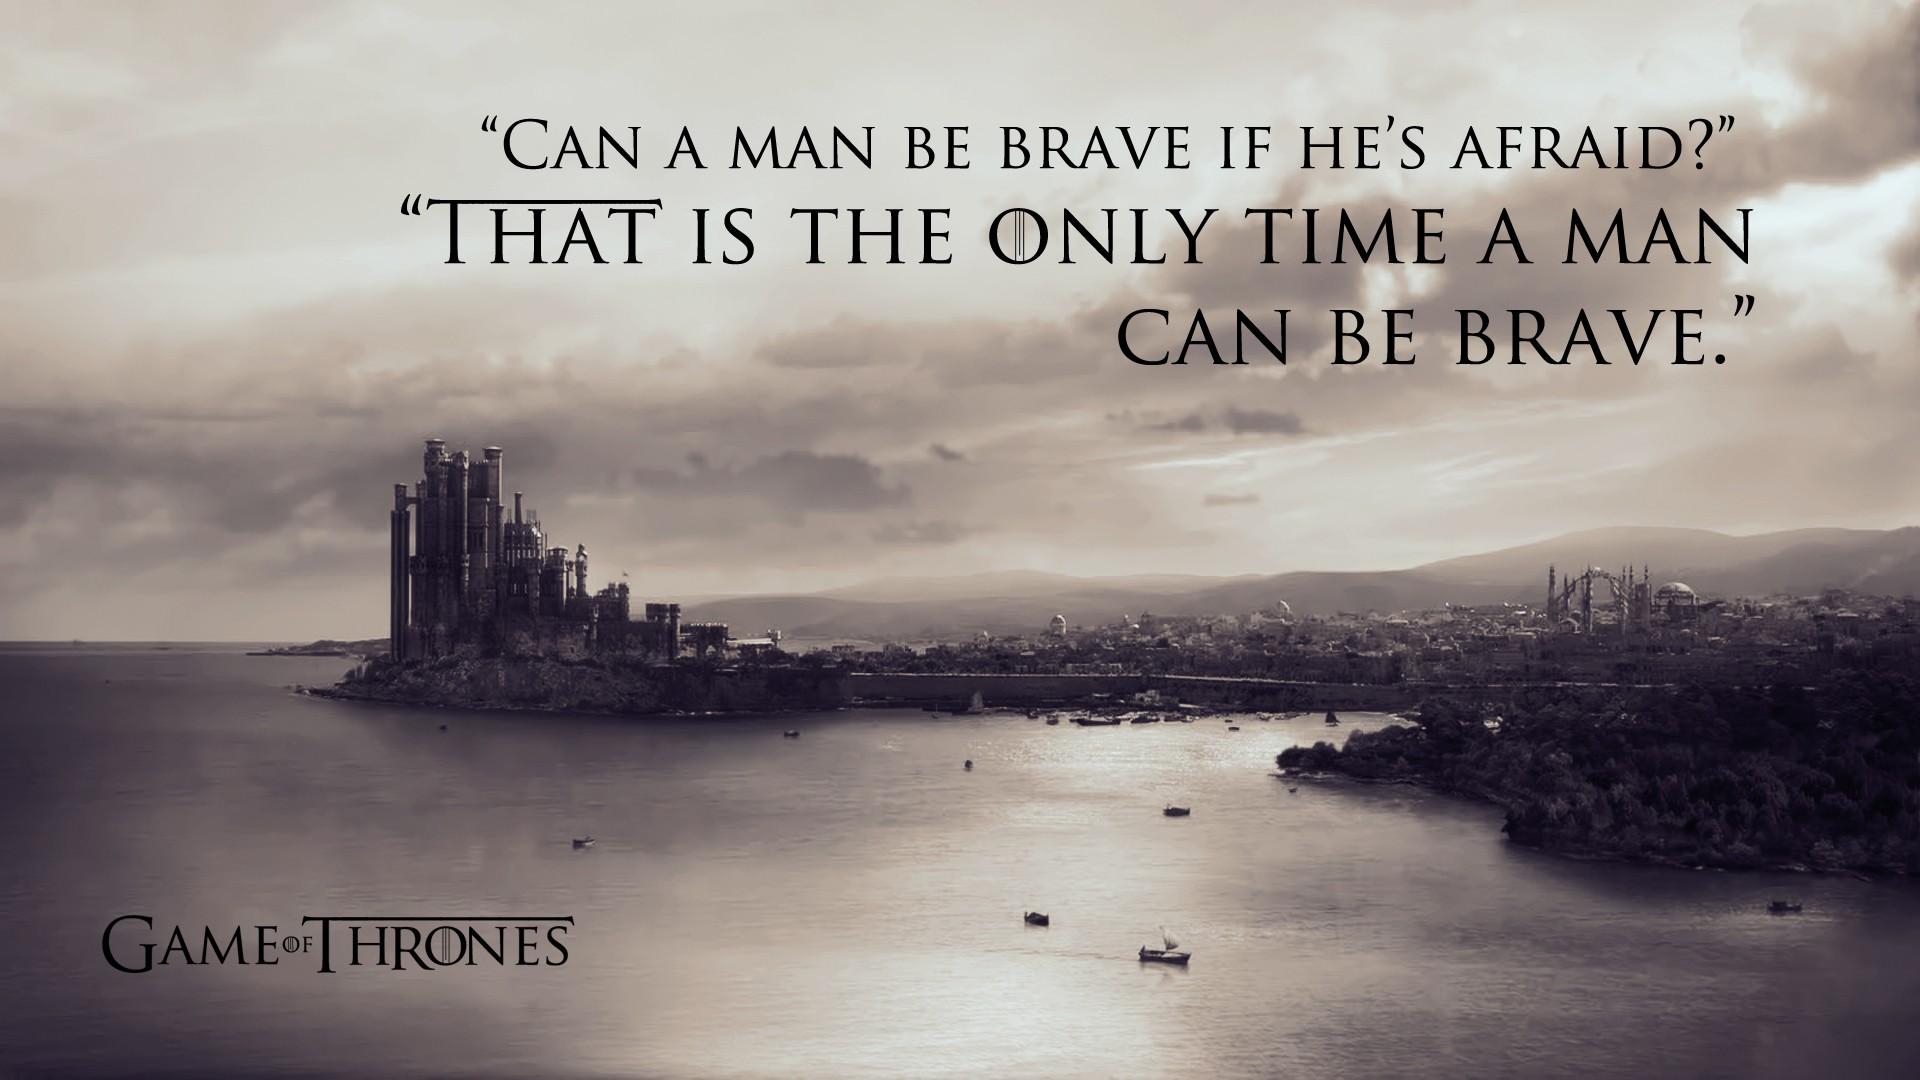 Game Of Thrones Quote Wallpaper wallpapers55com   Best Wallpapers 1920x1080